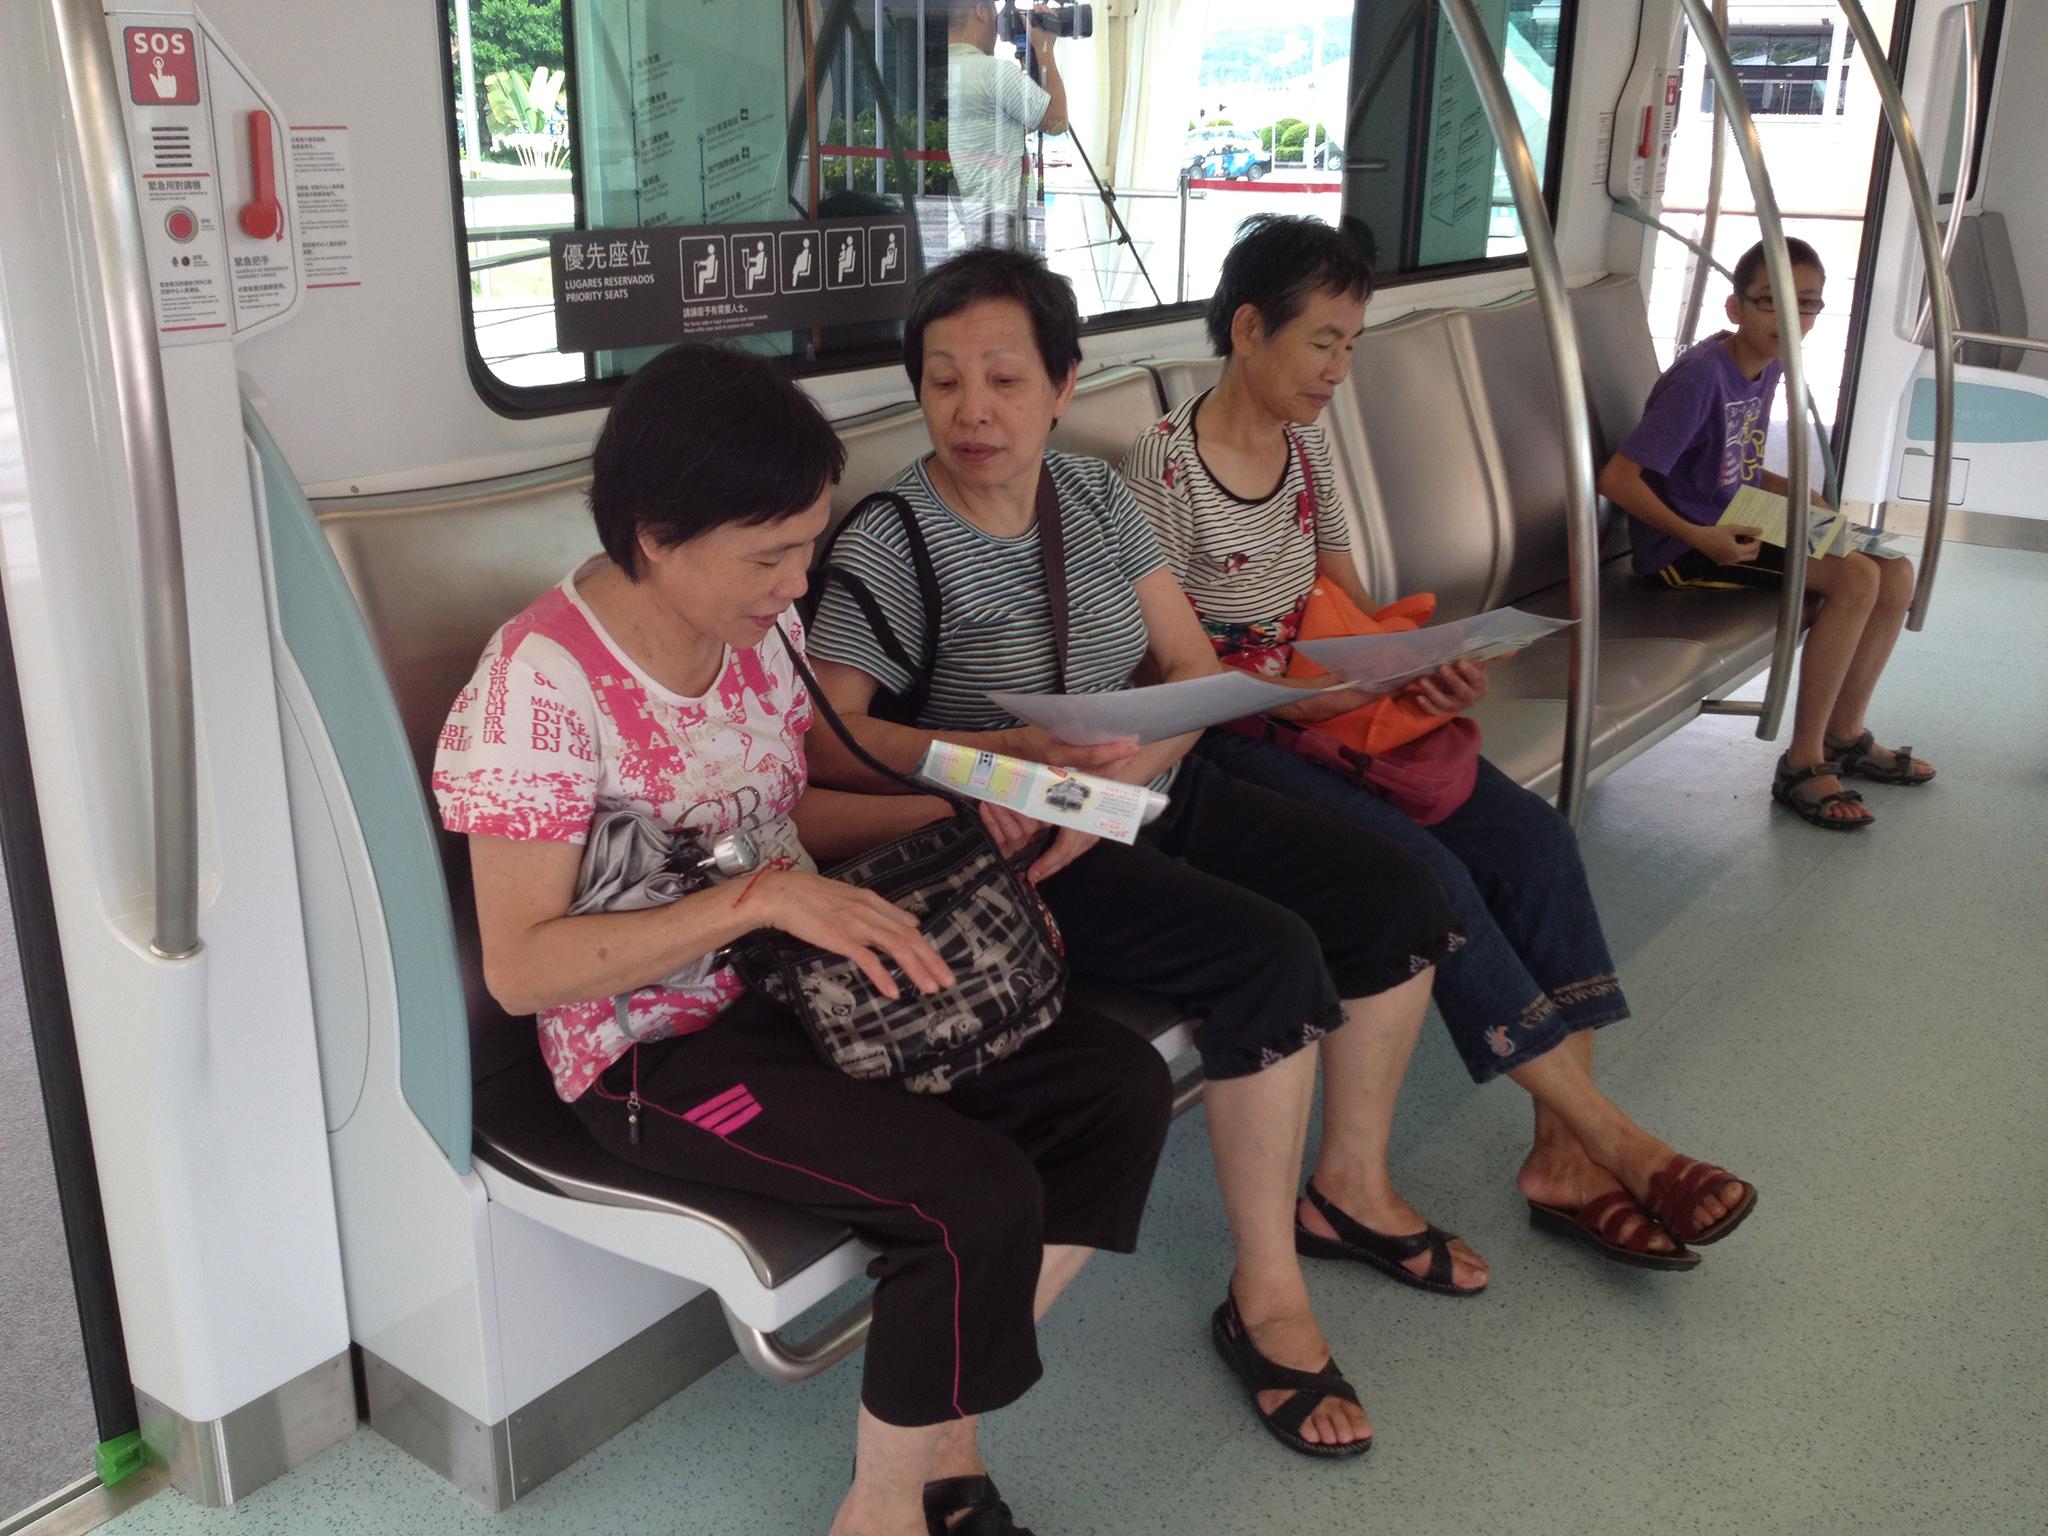 Lei do metro | Divulgados resultados sobre consulta pública